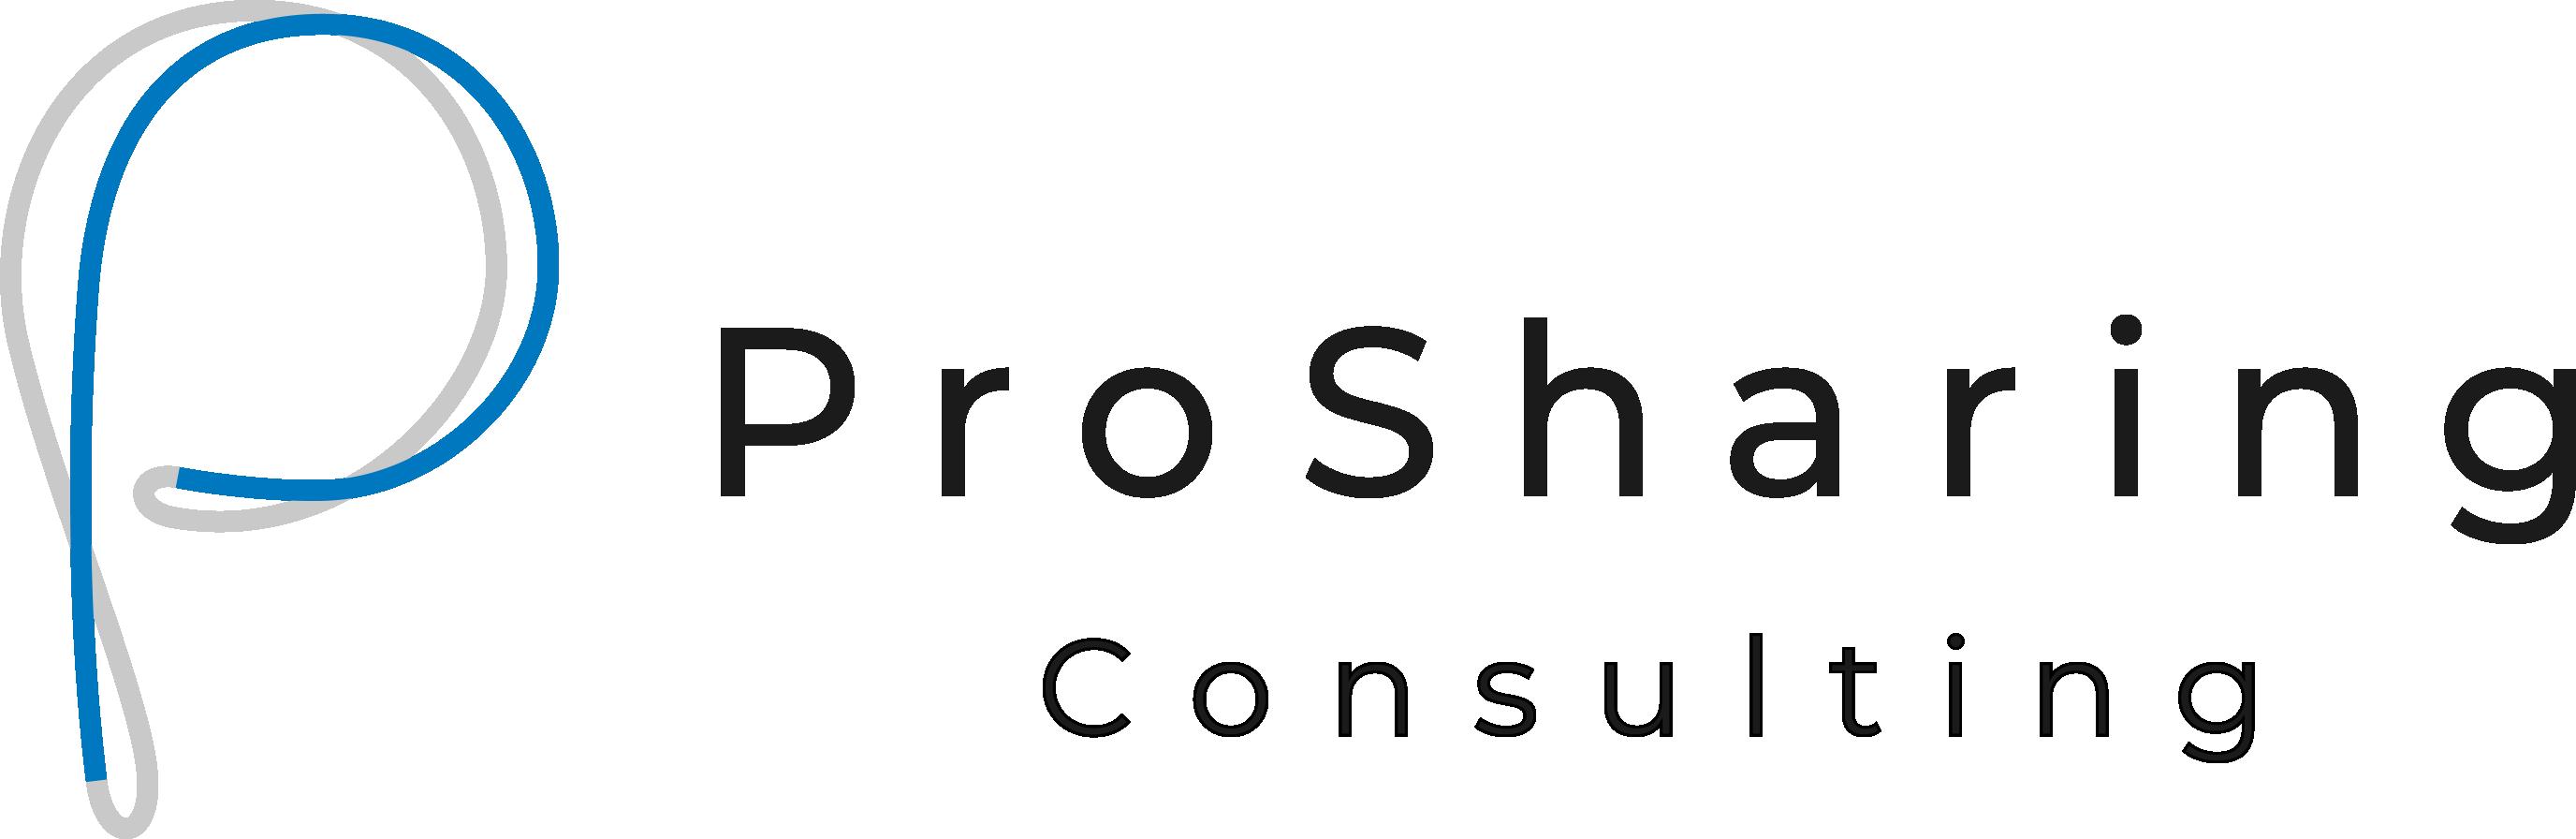 ProSharing Consulting(プロシェアリングコンサルティング)